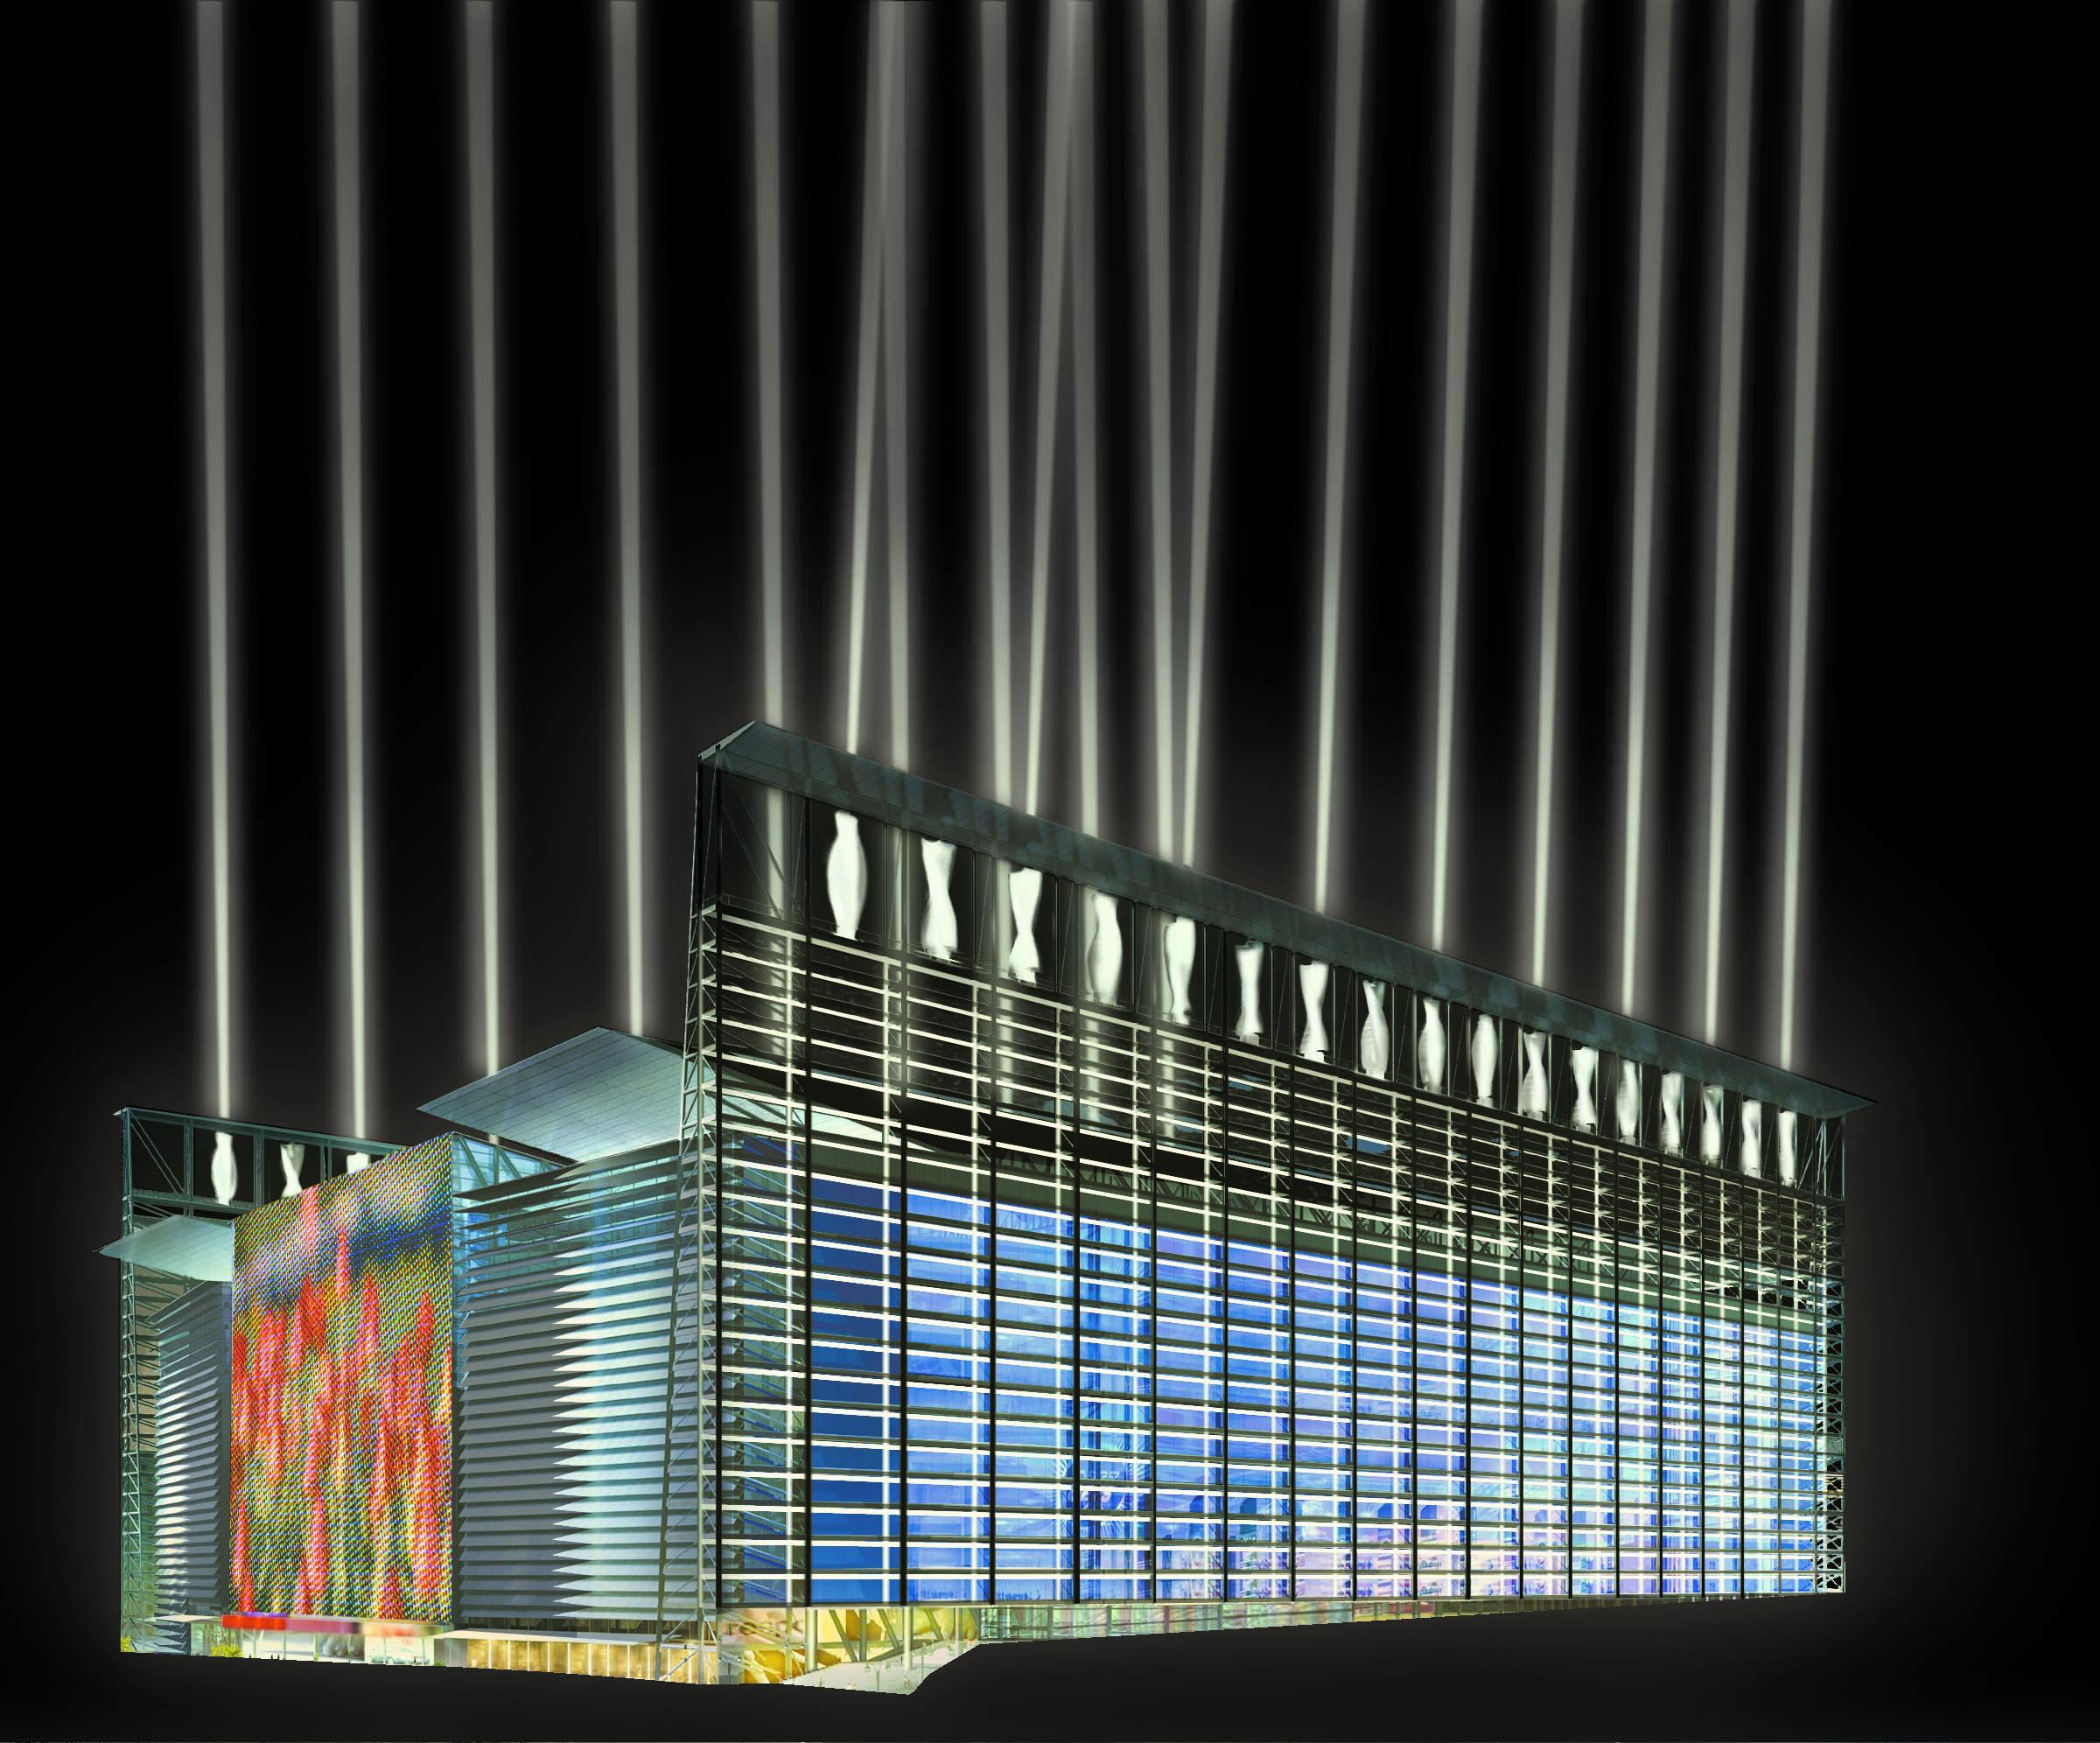 New York Jets Stadium Proposal (2004)